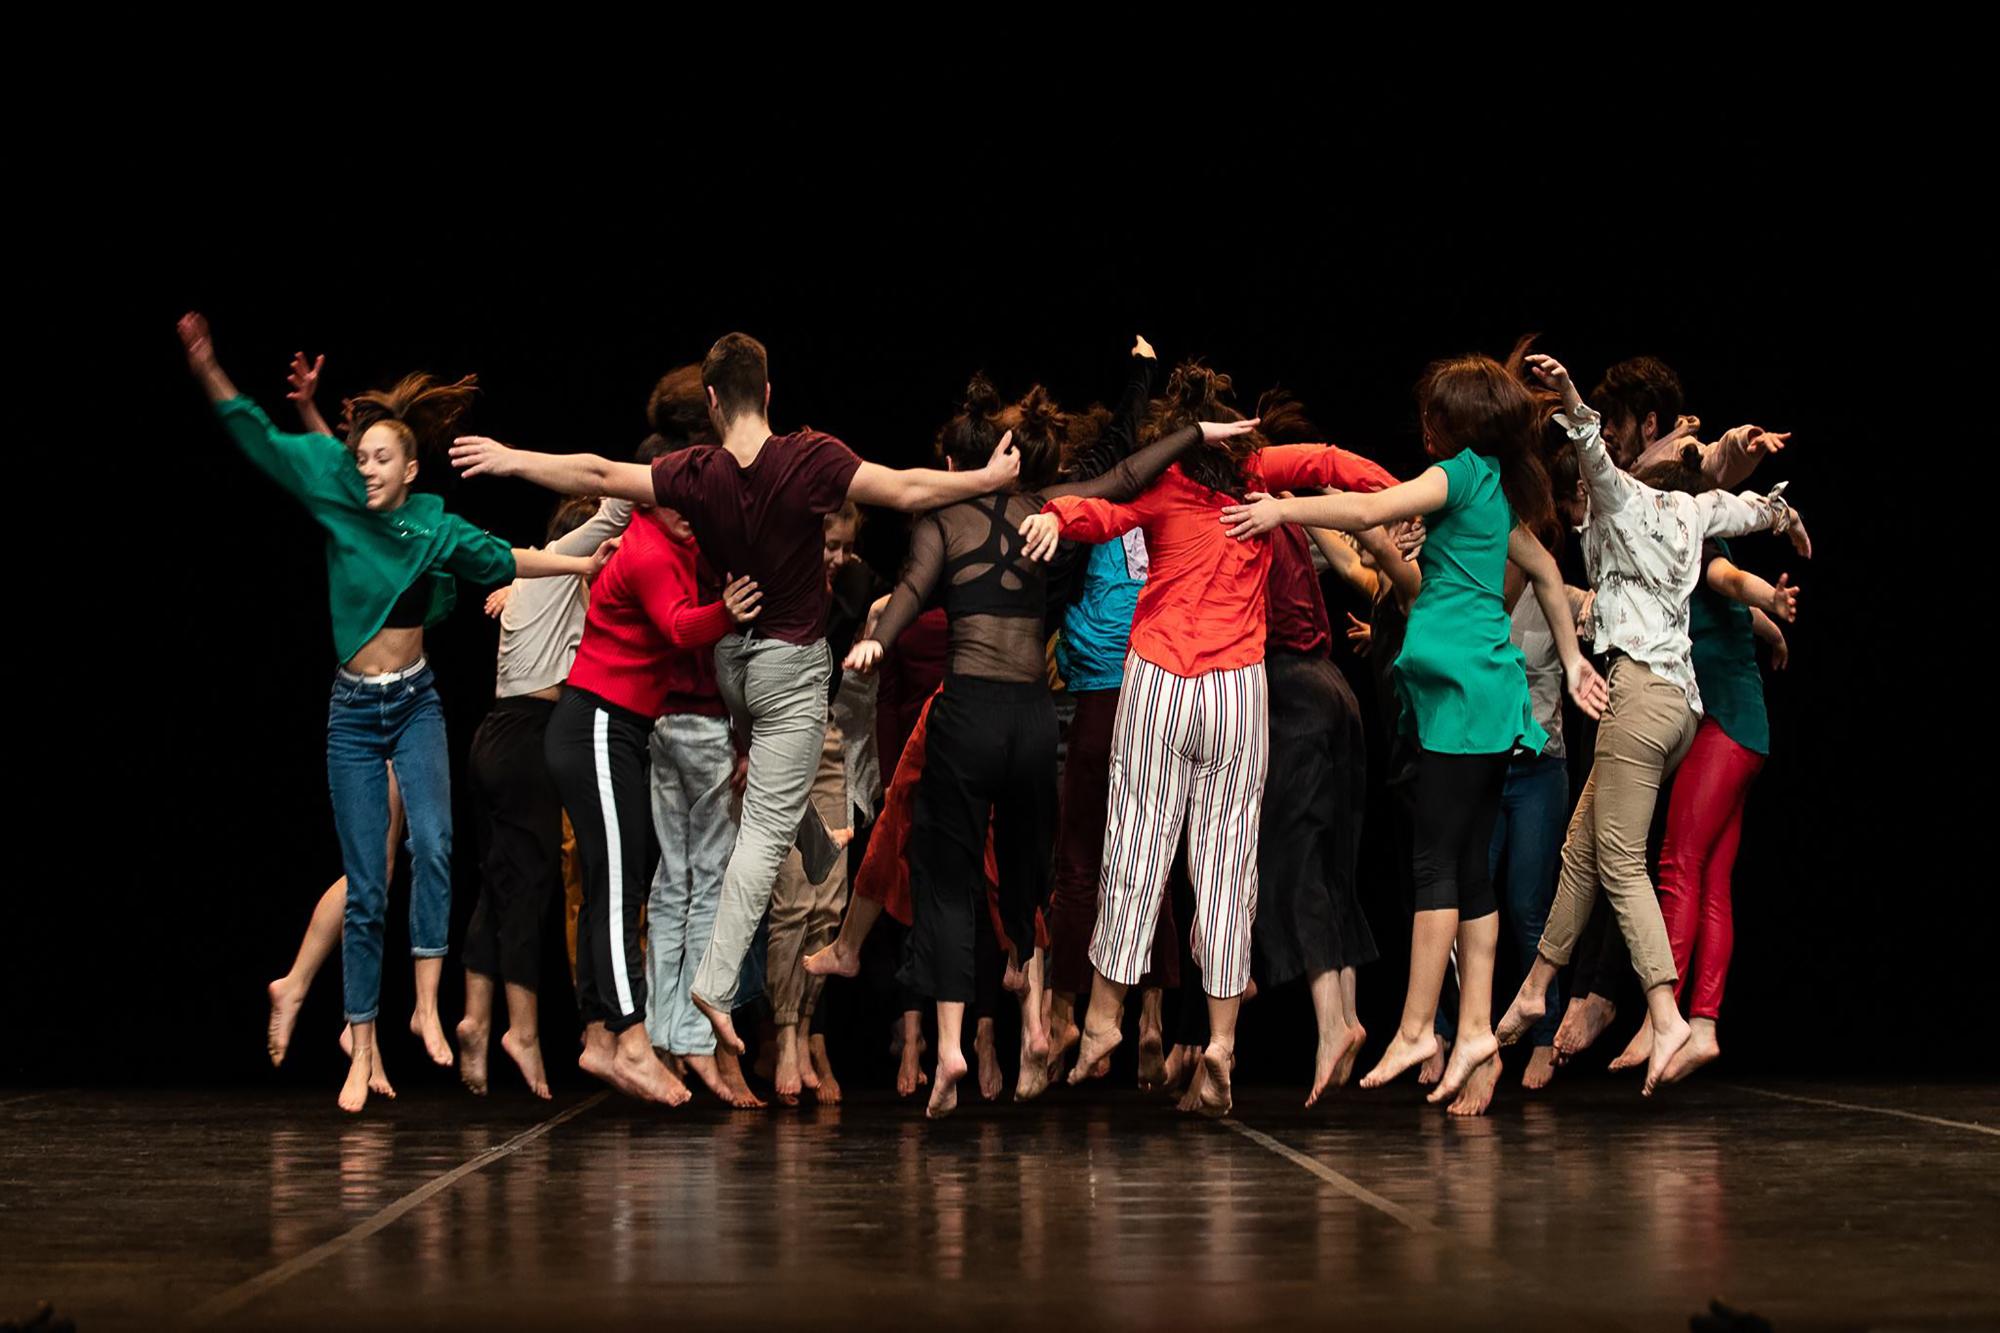 8eb3f87ea Balleteatro: 30 anos de palcos e memórias - JPN